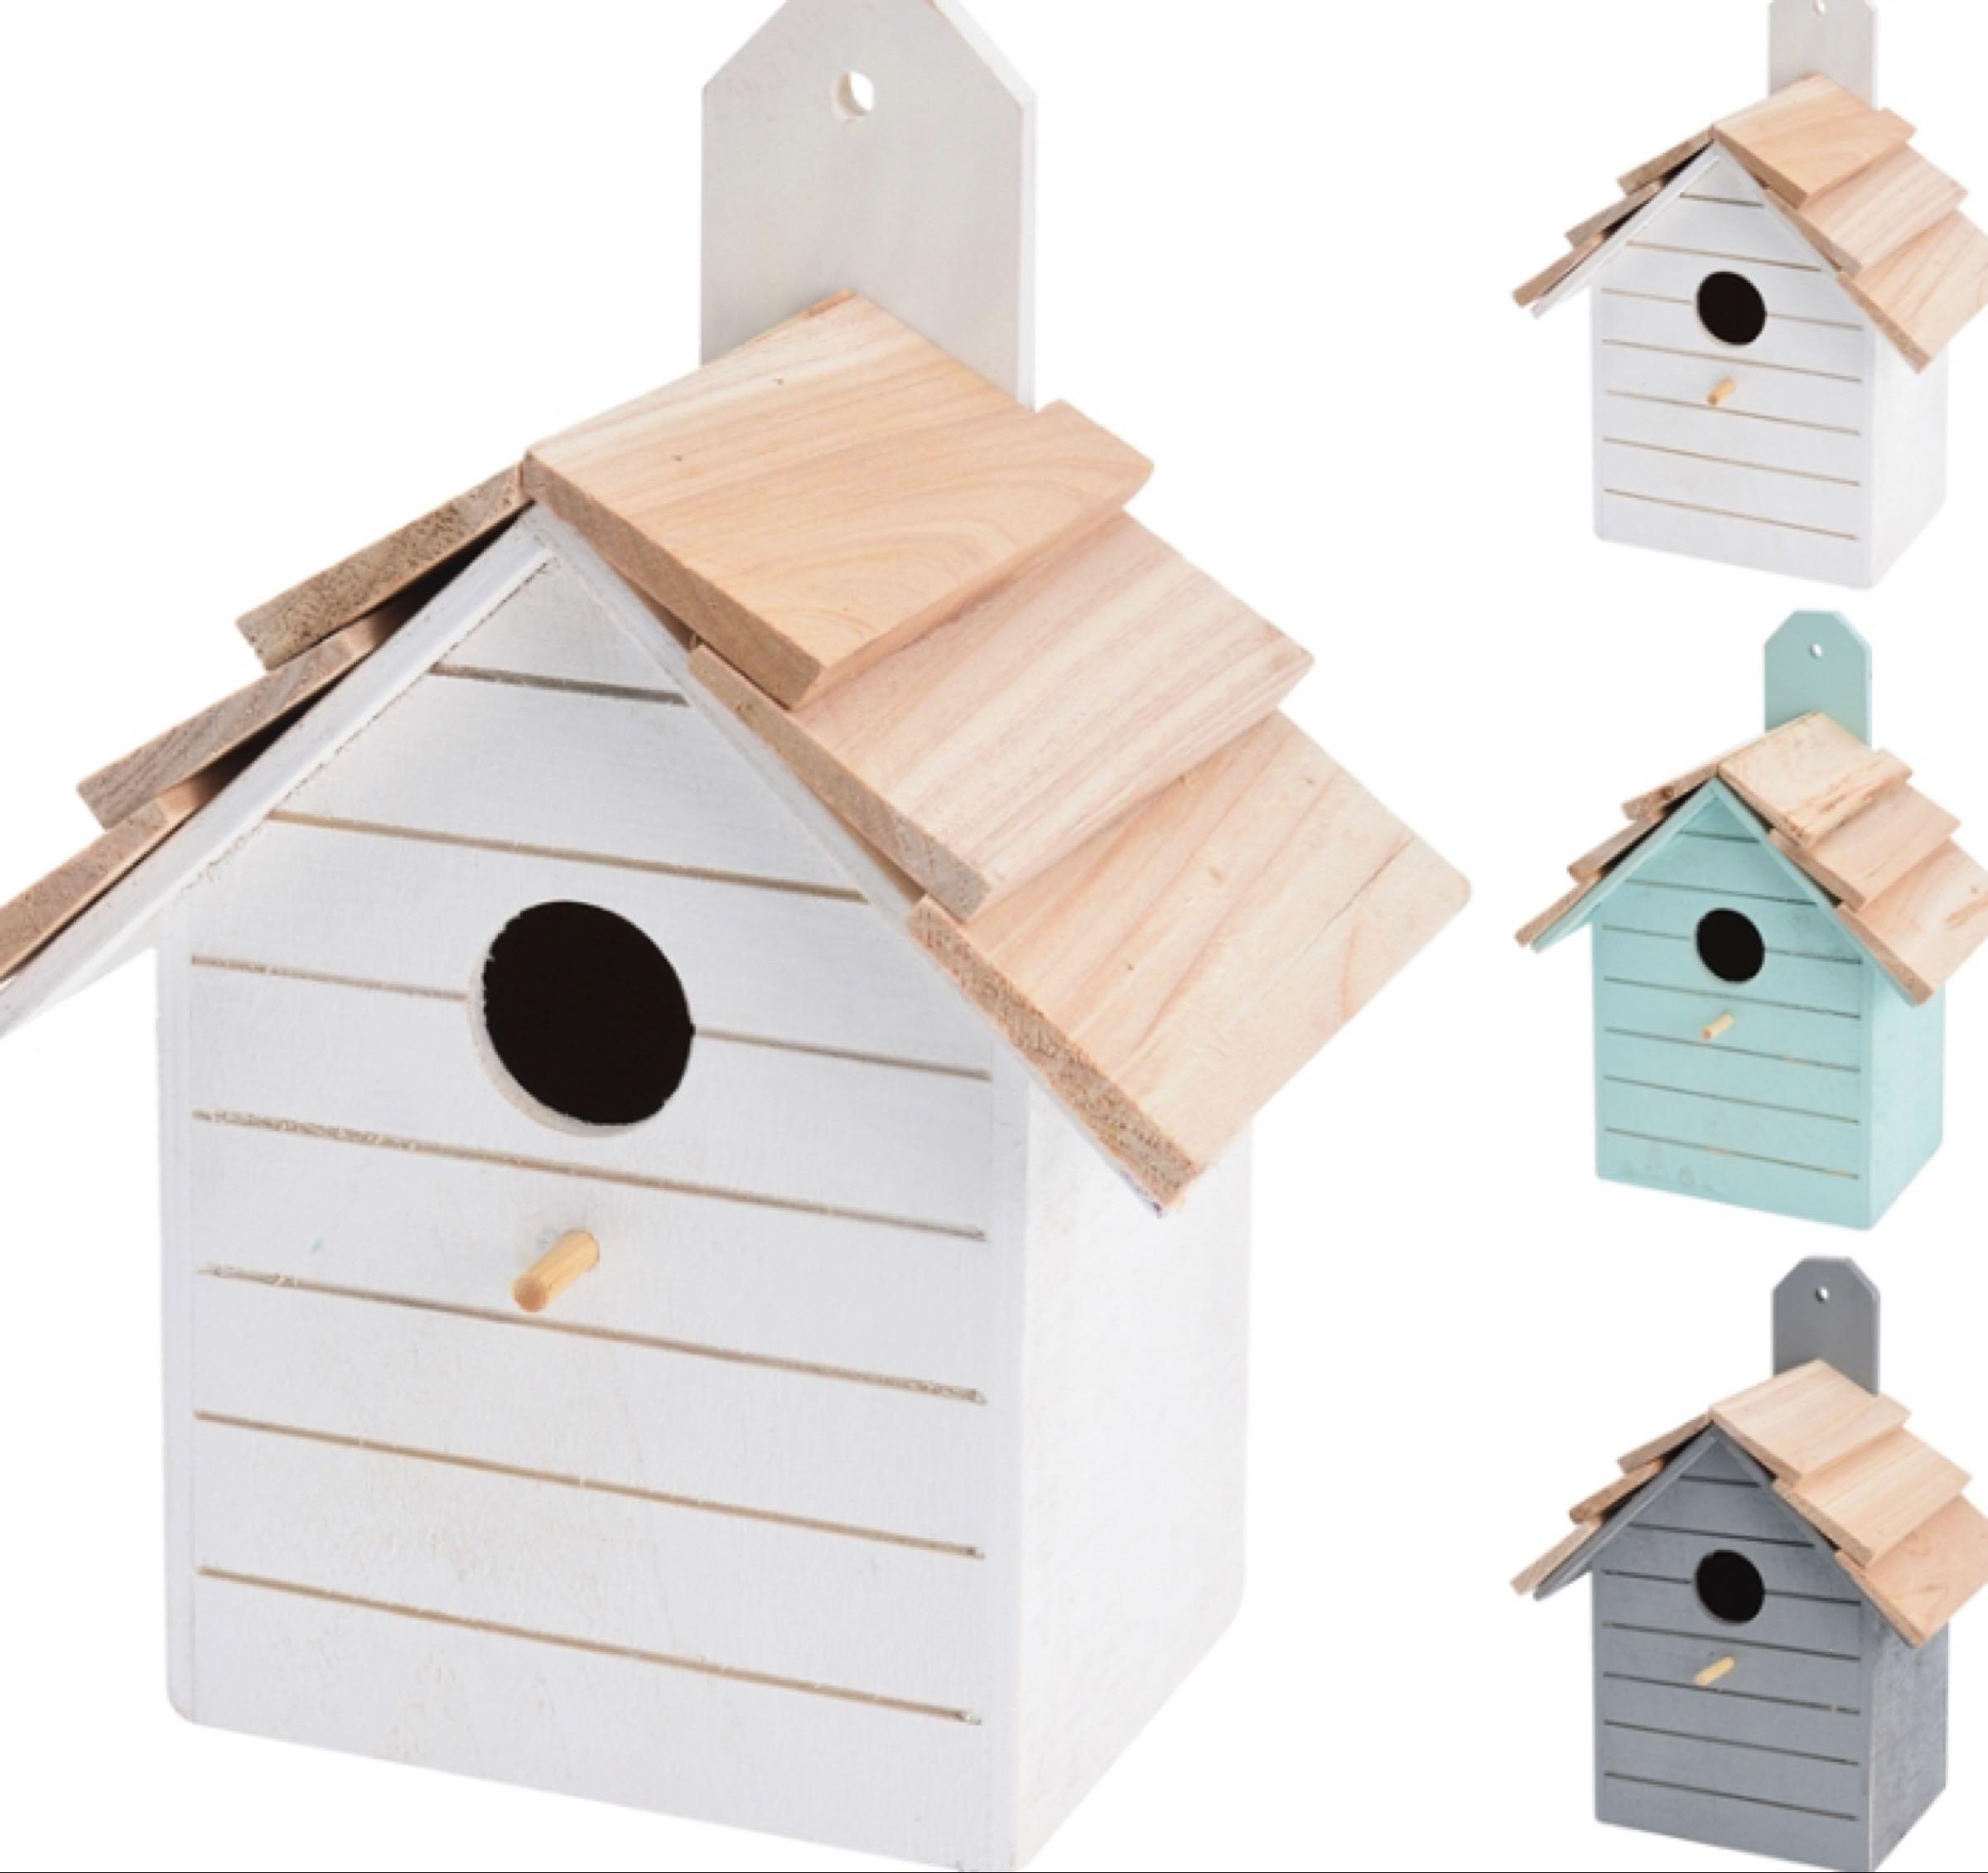 Wooden Coloured Birdhouse 22cmx16cmx10.5cm